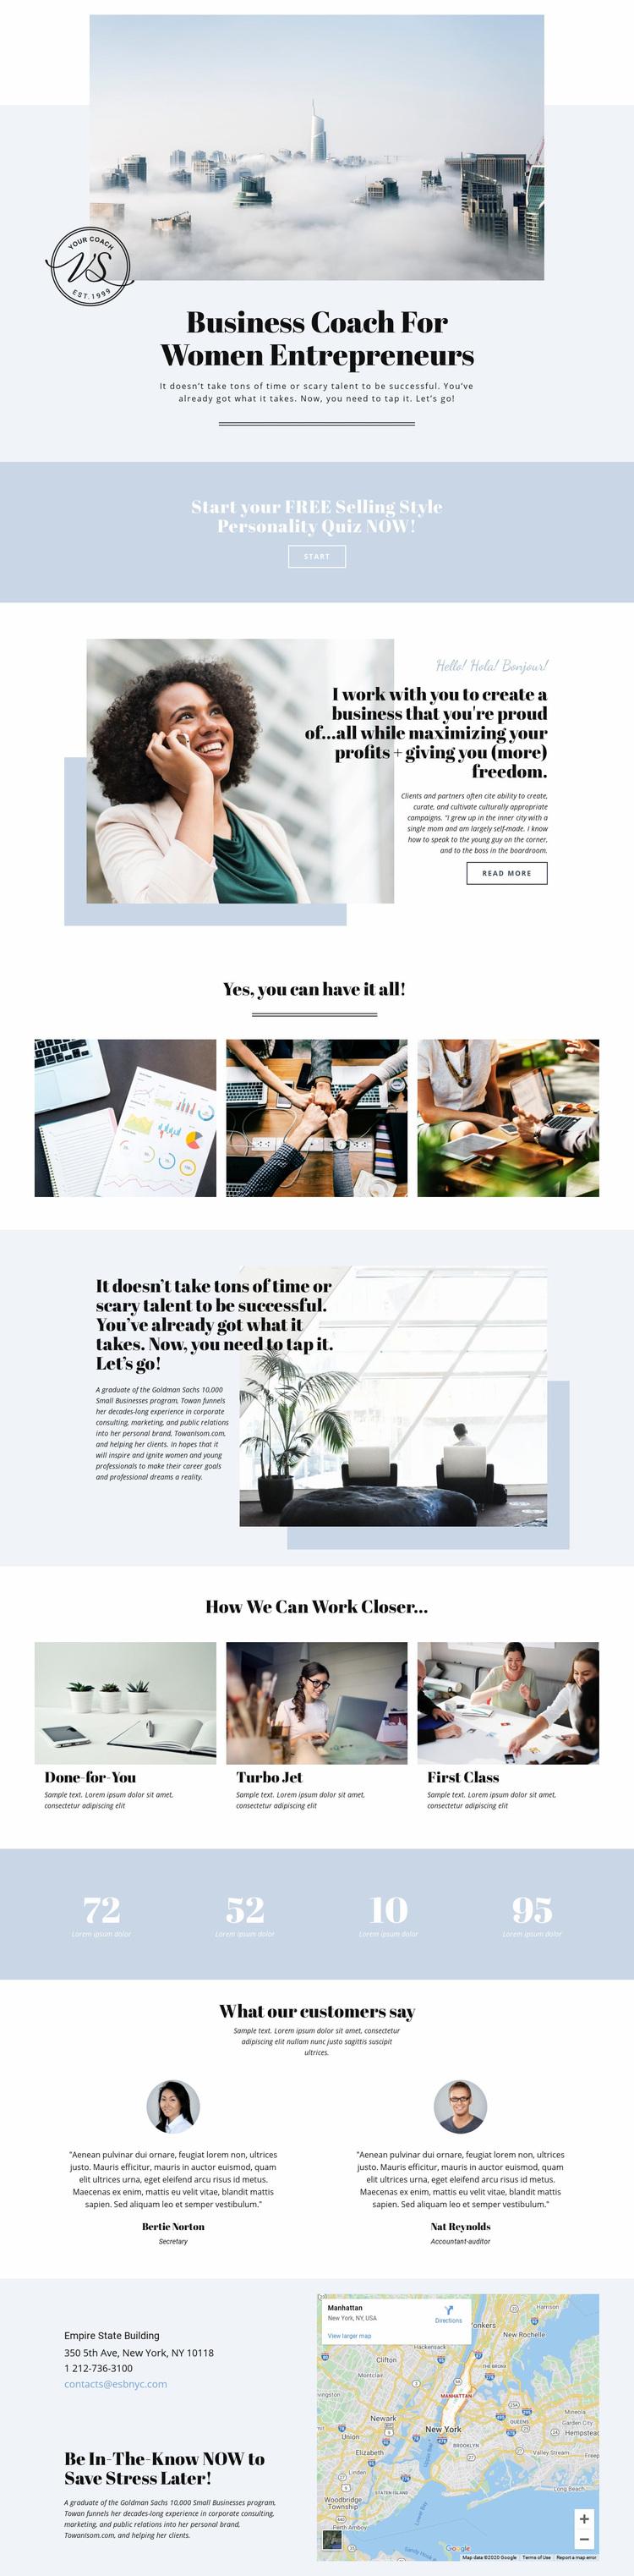 Business women entrepreneurs Web Page Designer